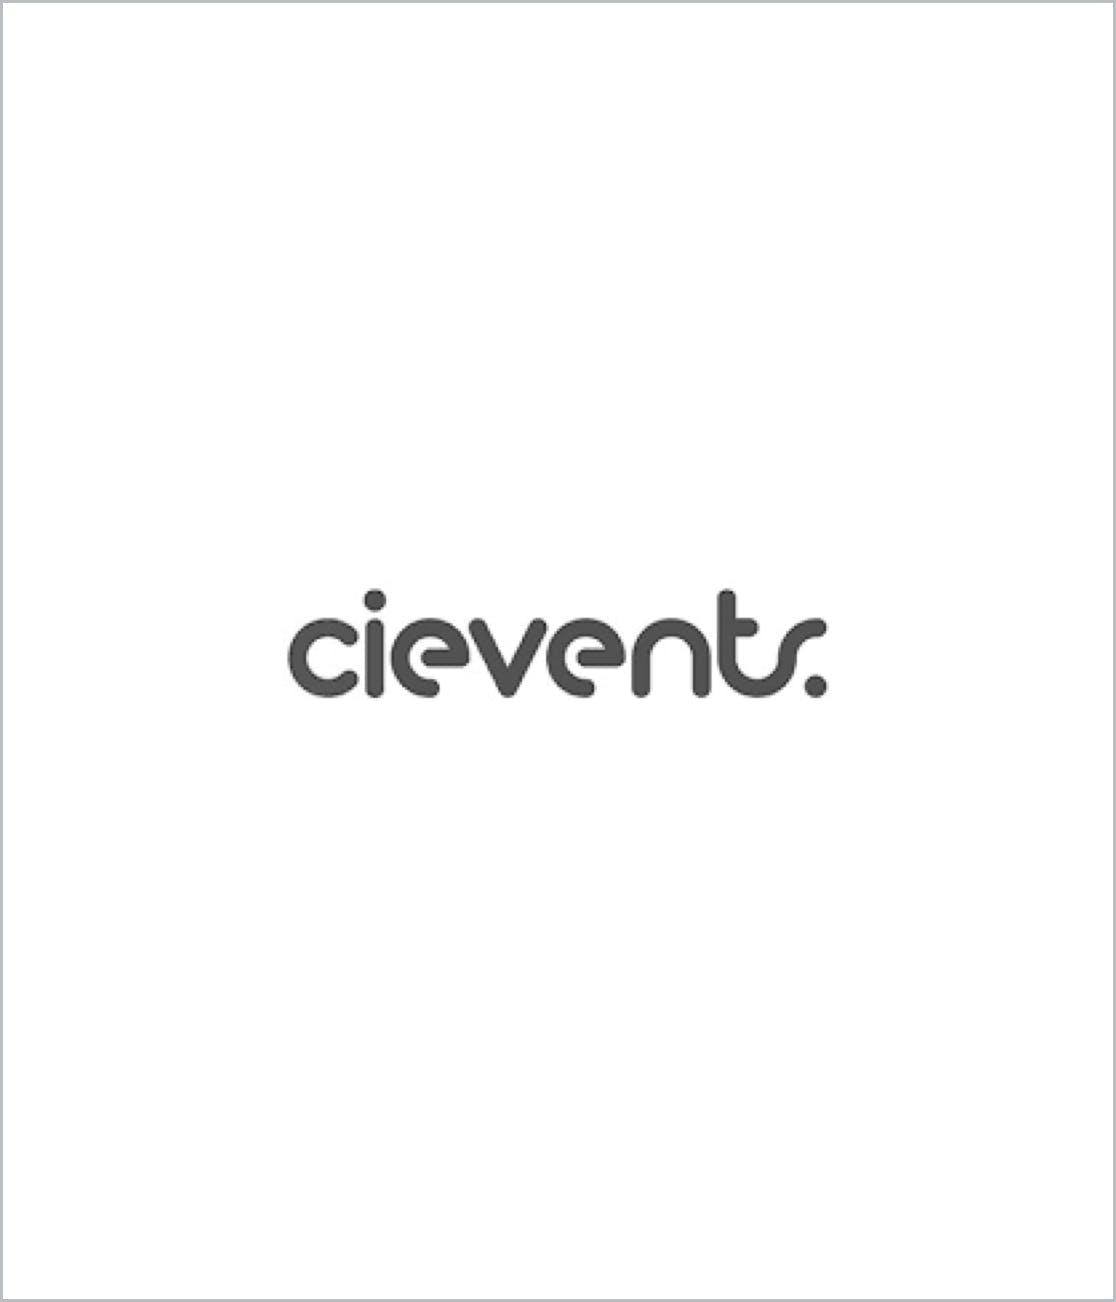 Cievents Logo Supplier